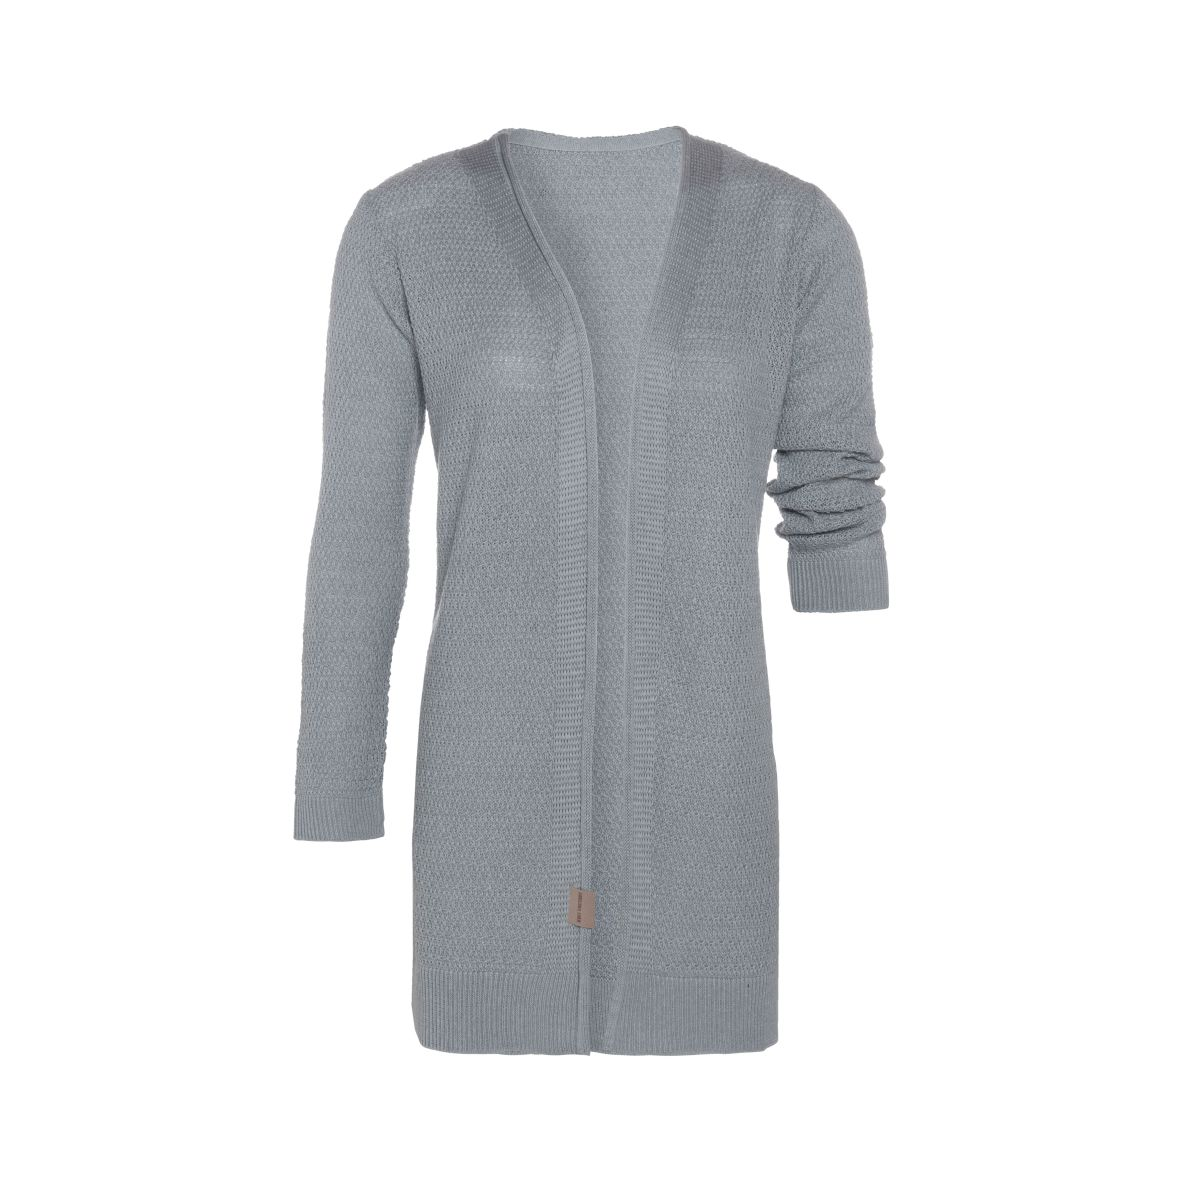 knit factory kf14108101151 june vest licht grijs 4042 1